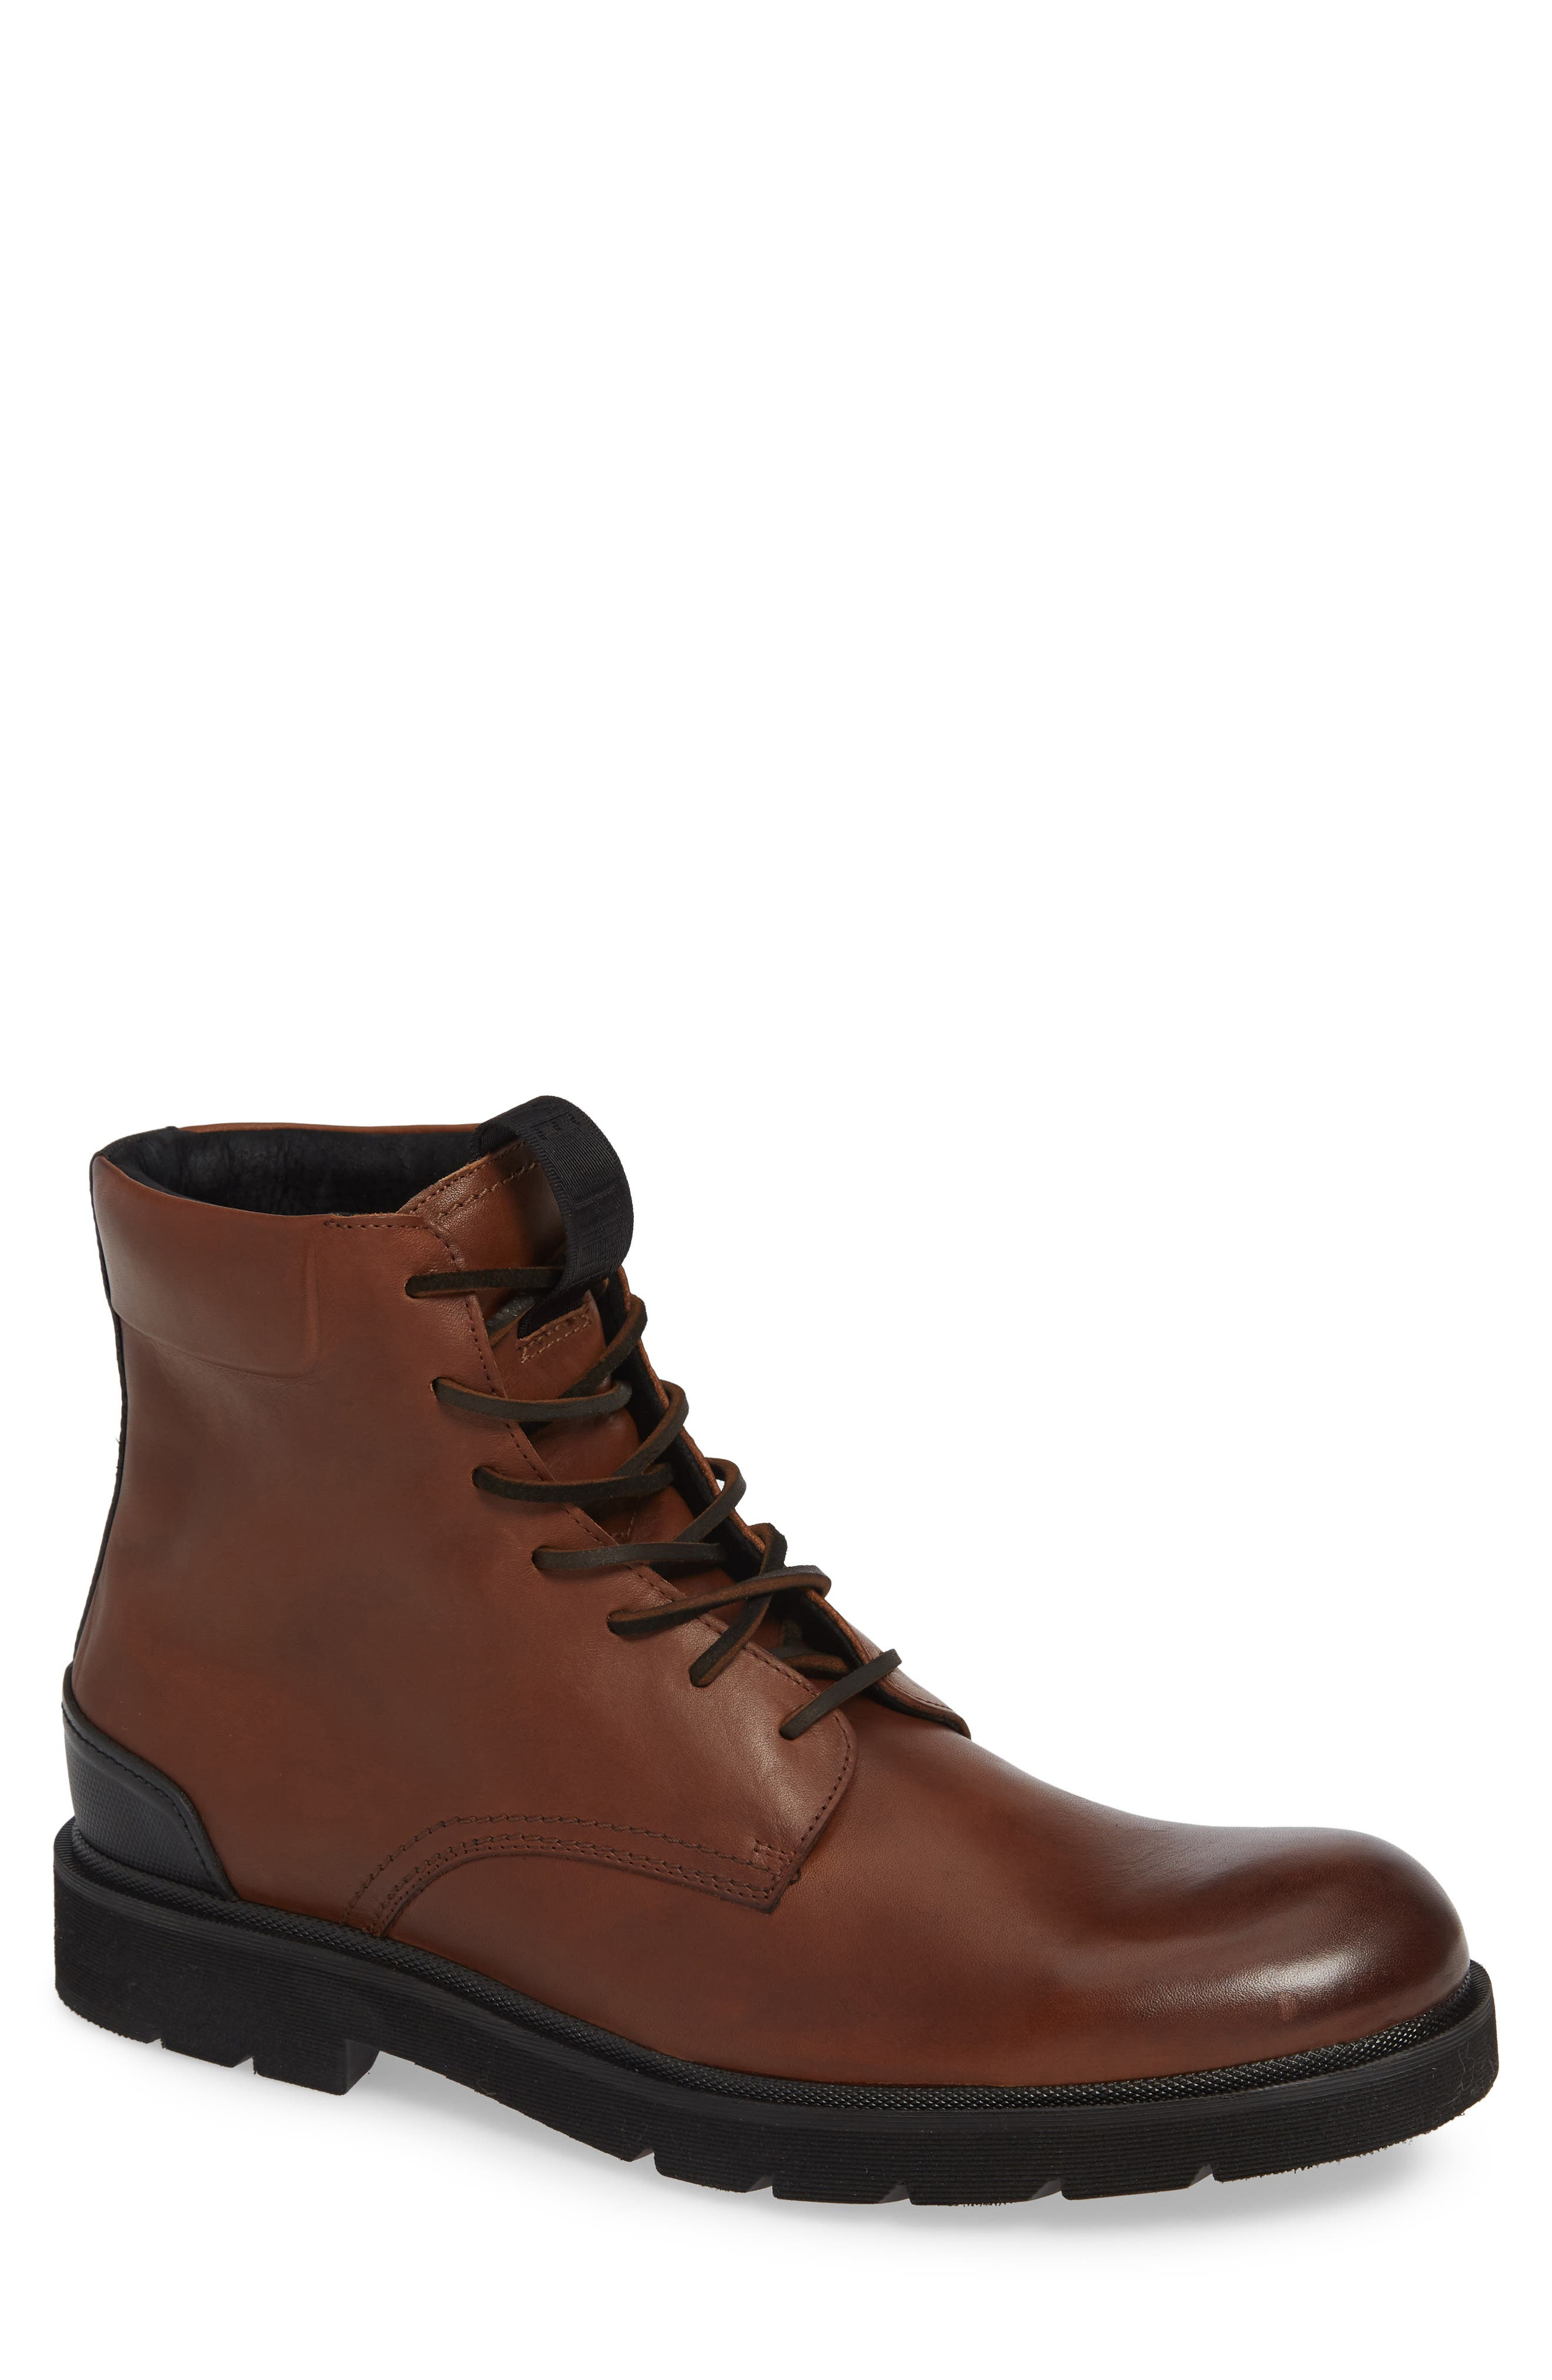 Terra Plain Toe Boot,                         Main,                         color, 235